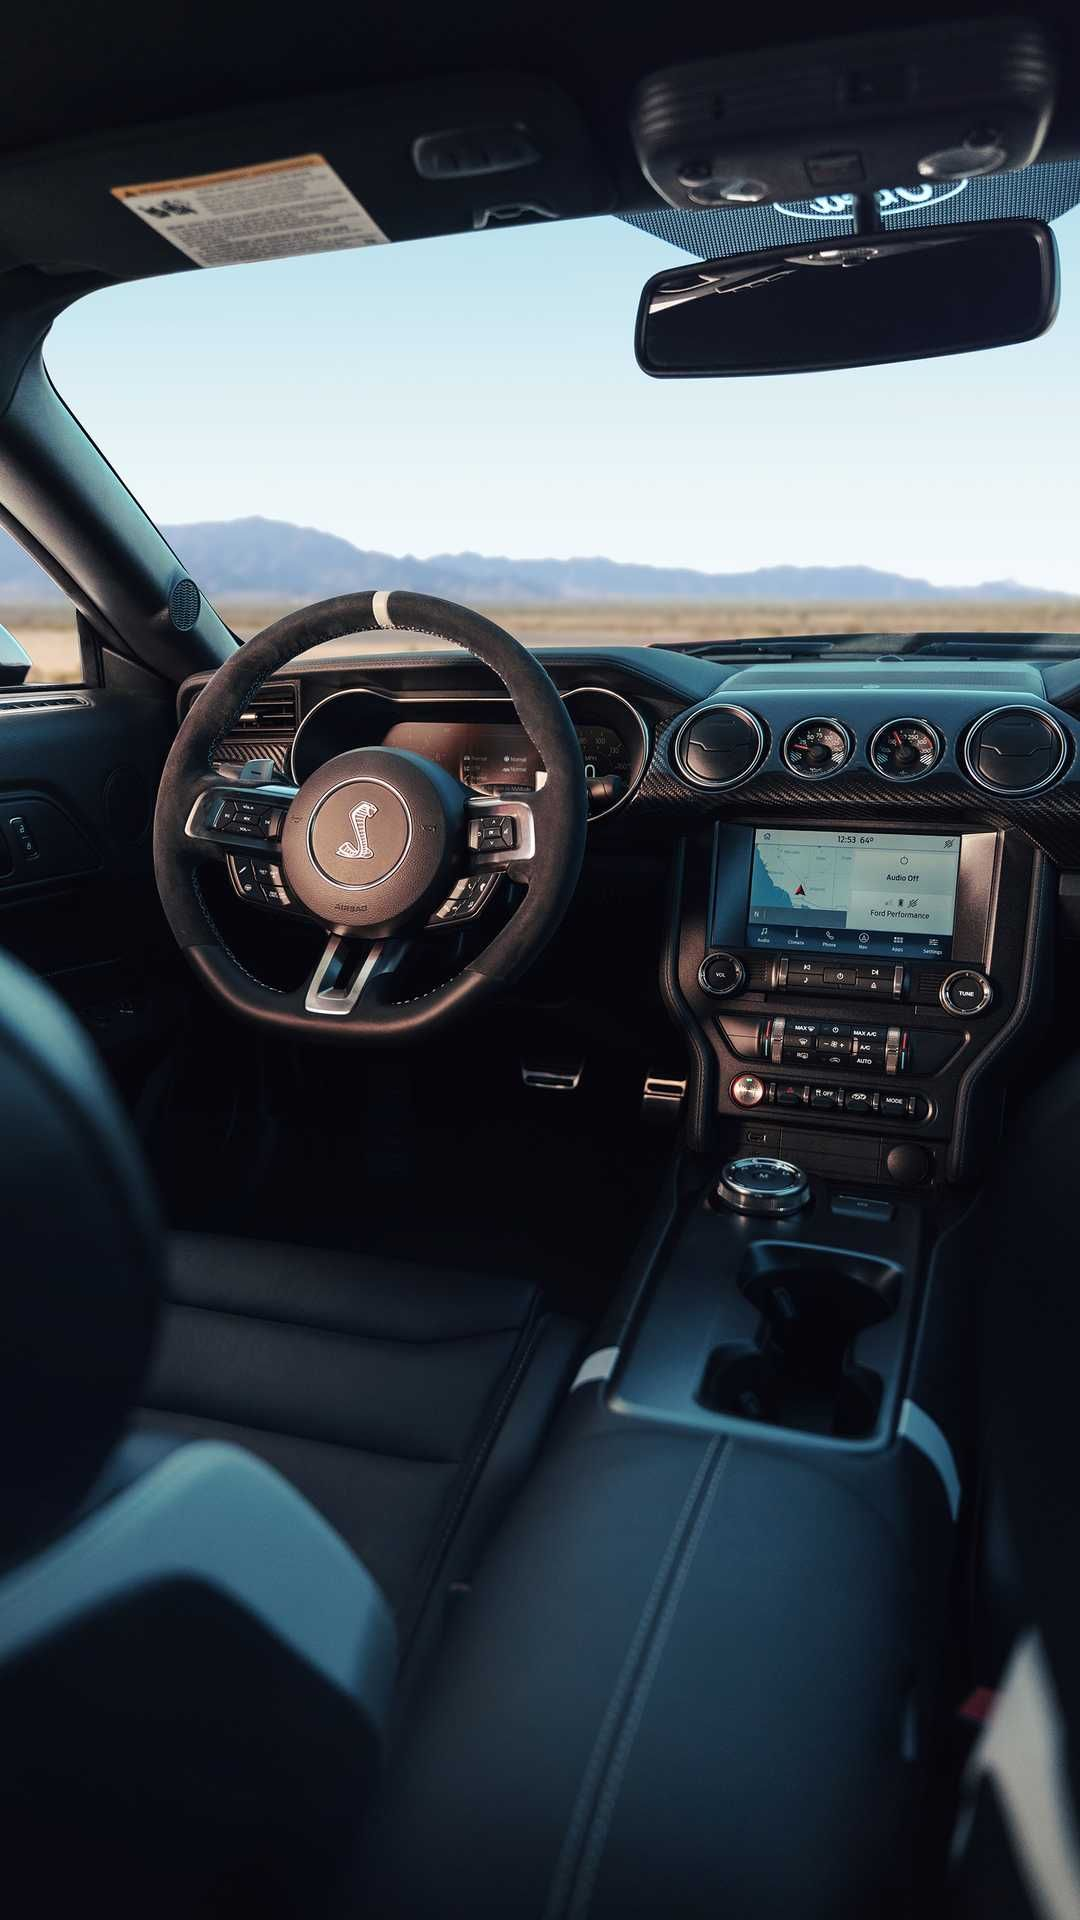 New, 2020 Ford Mustang Shelby GT500, interior Carros de